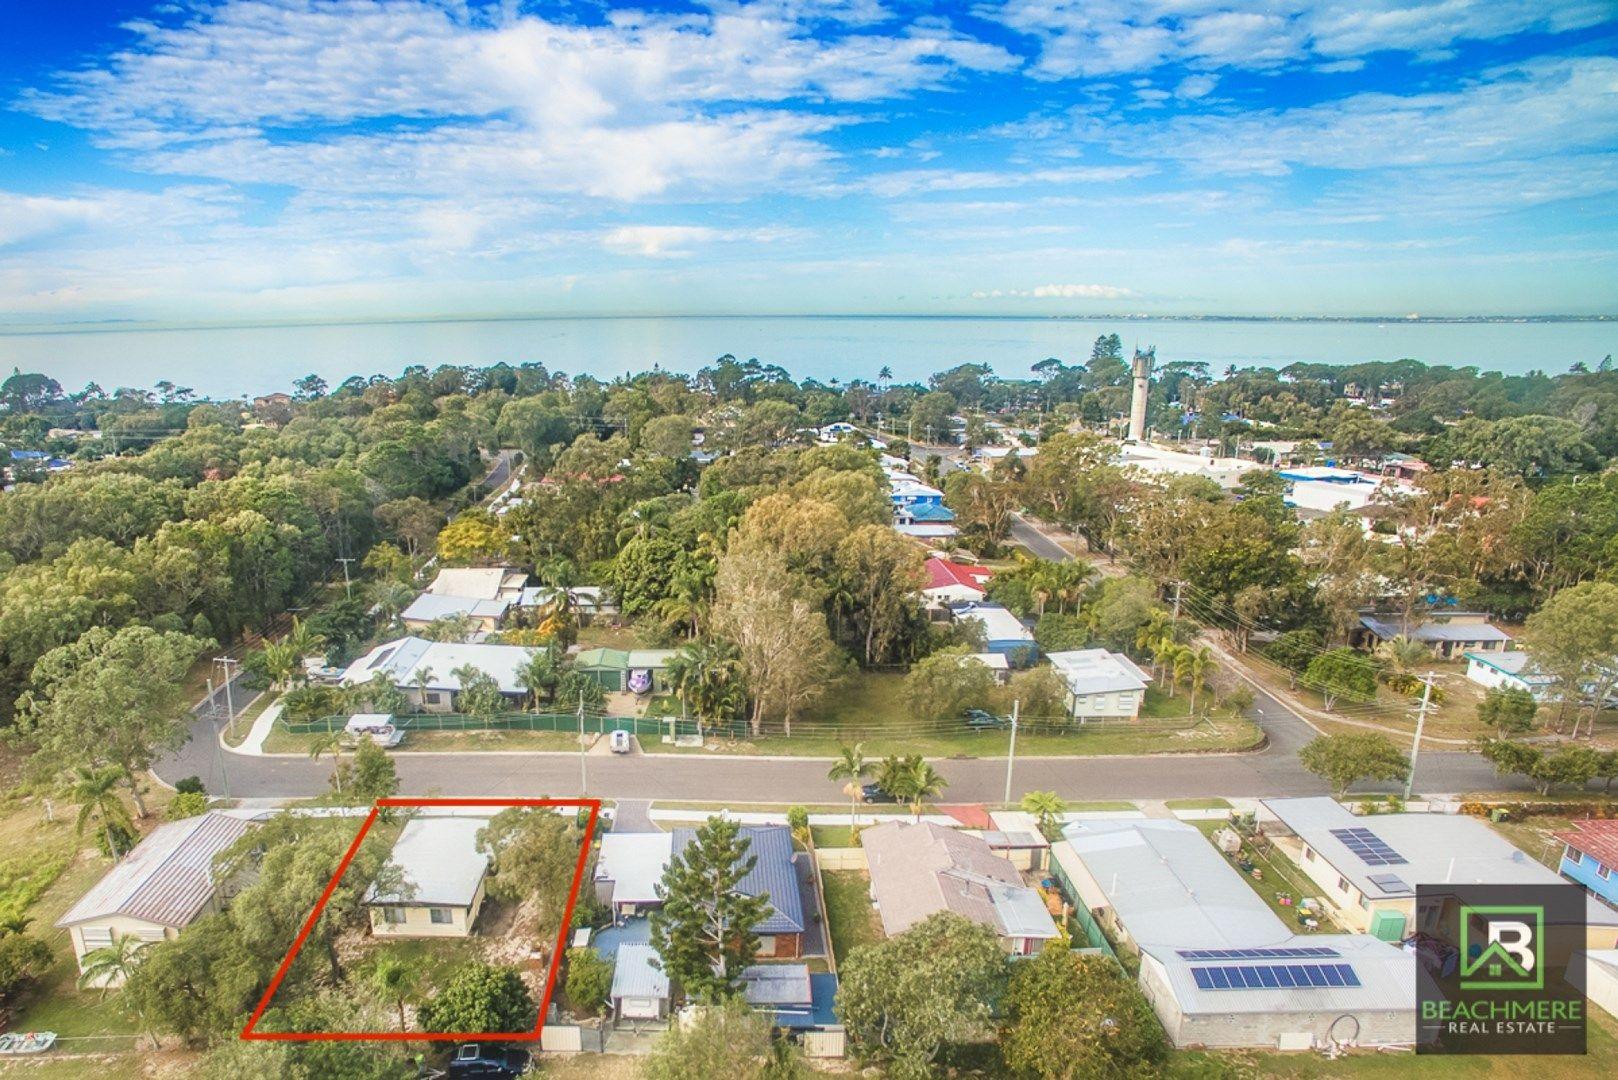 24 EGAN Avenue, Beachmere QLD 4510, Image 0